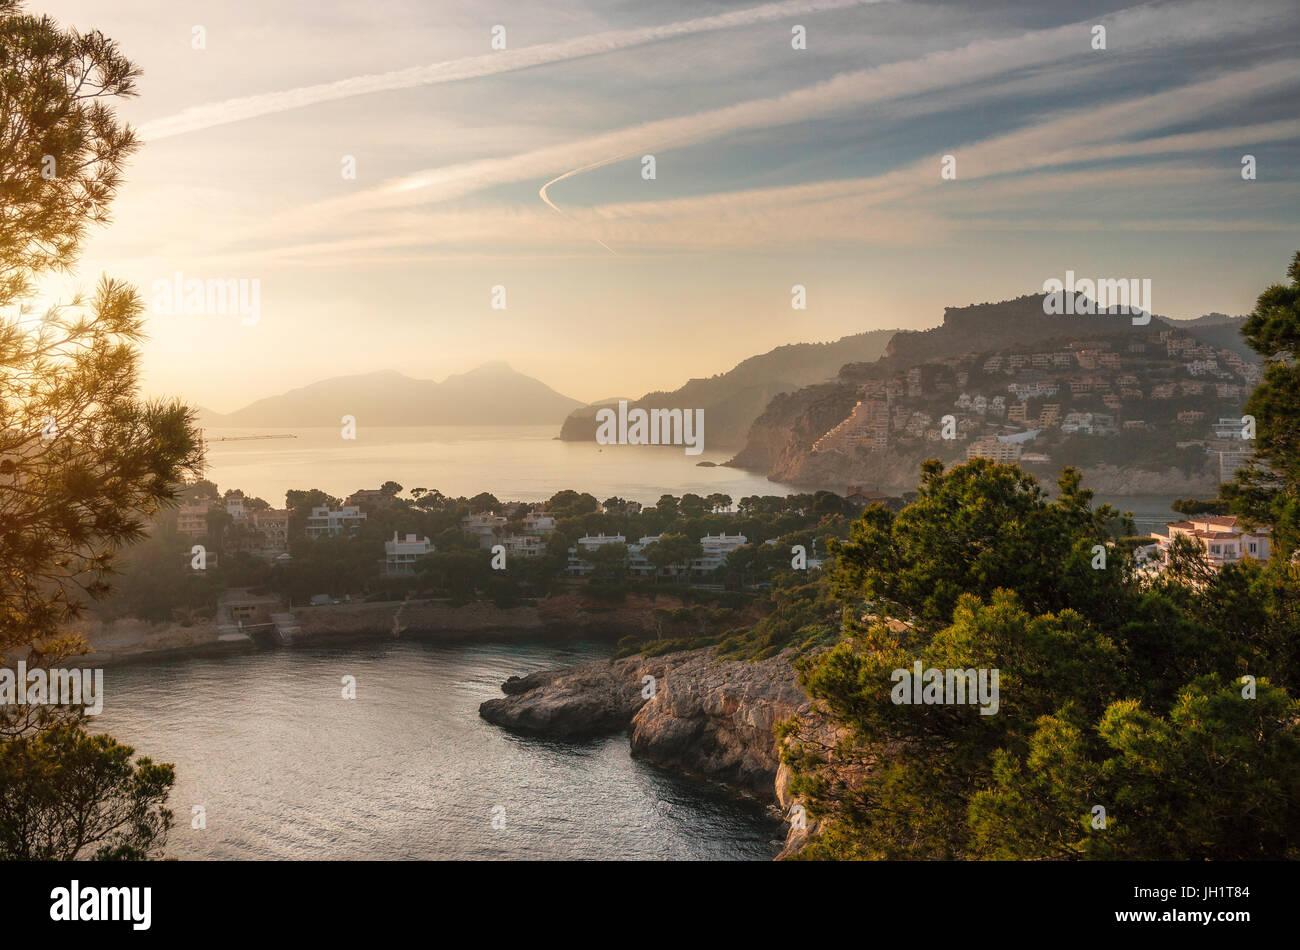 Luftaufnahme des Dorfes von Port Andratx und Villen des Cap de sa Mola bei Sonnenuntergang, Mallorca, Balearen, Stockbild